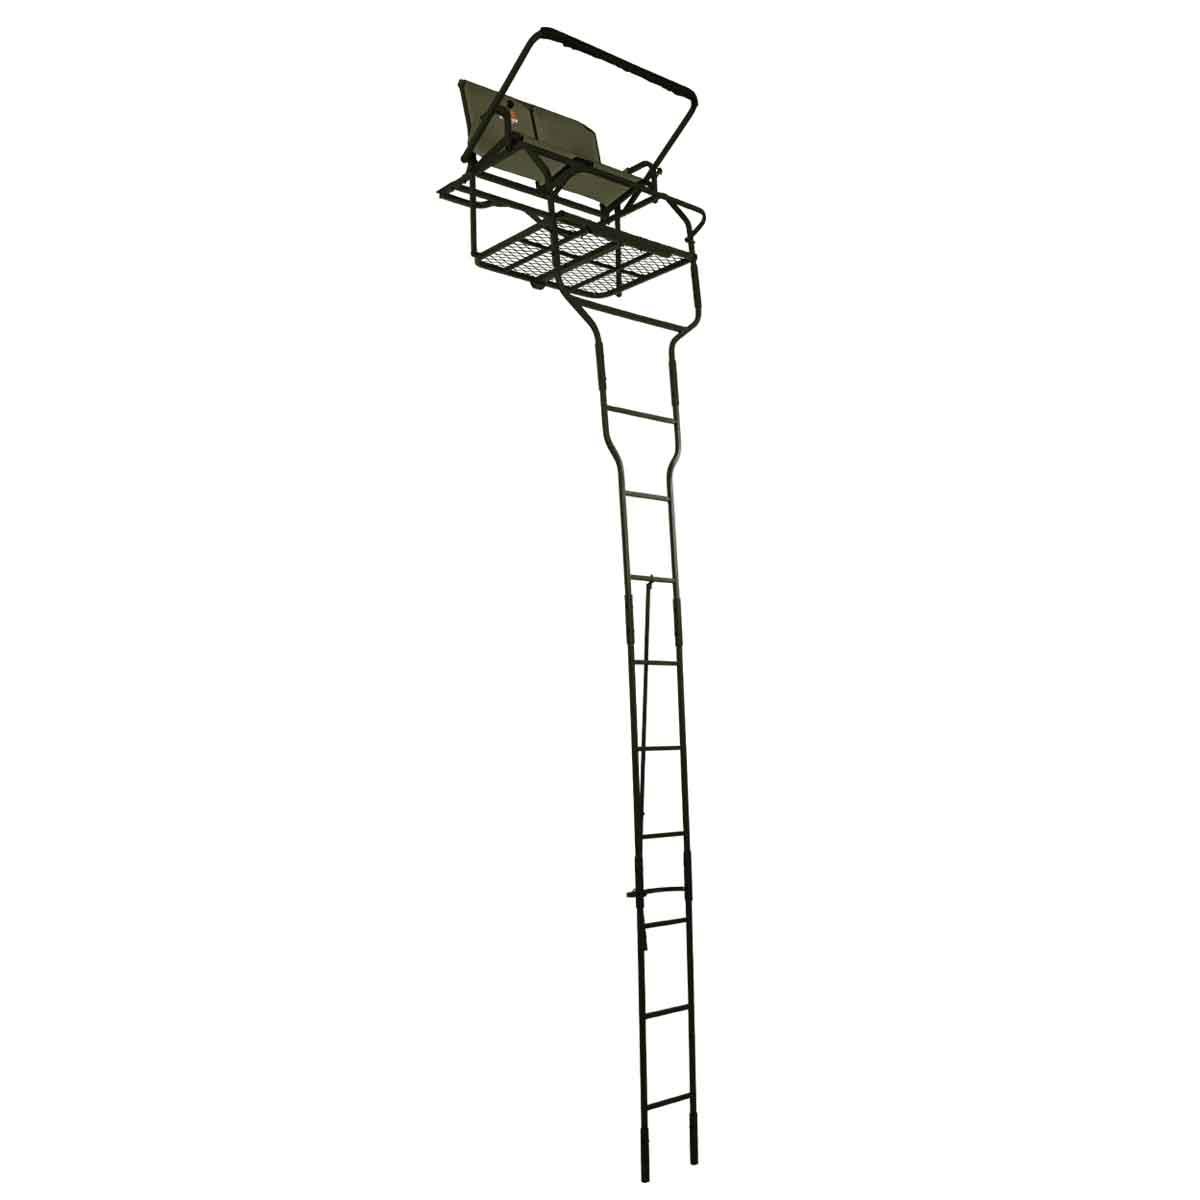 Millennium L205 Double Ladder Stand